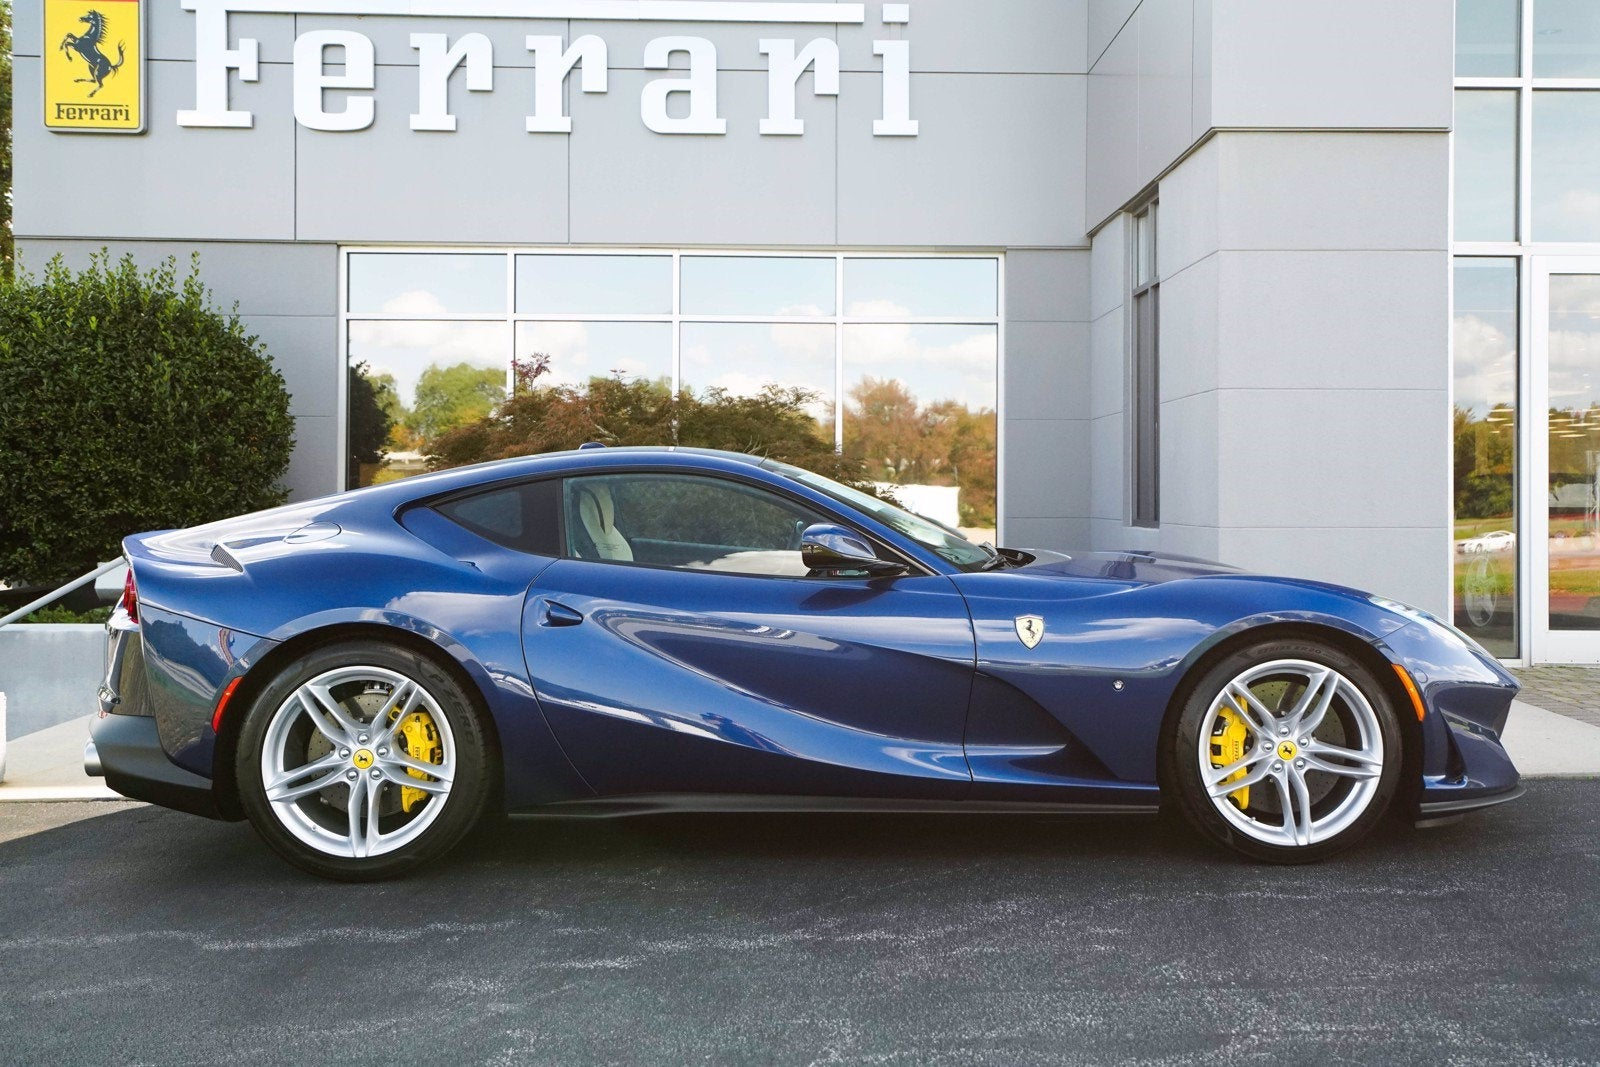 2018 Ferrari 812 Superfast Coupe Greensboro Nc Raleigh Winston Salem Durham North Carolina Zff83cla6j0233626